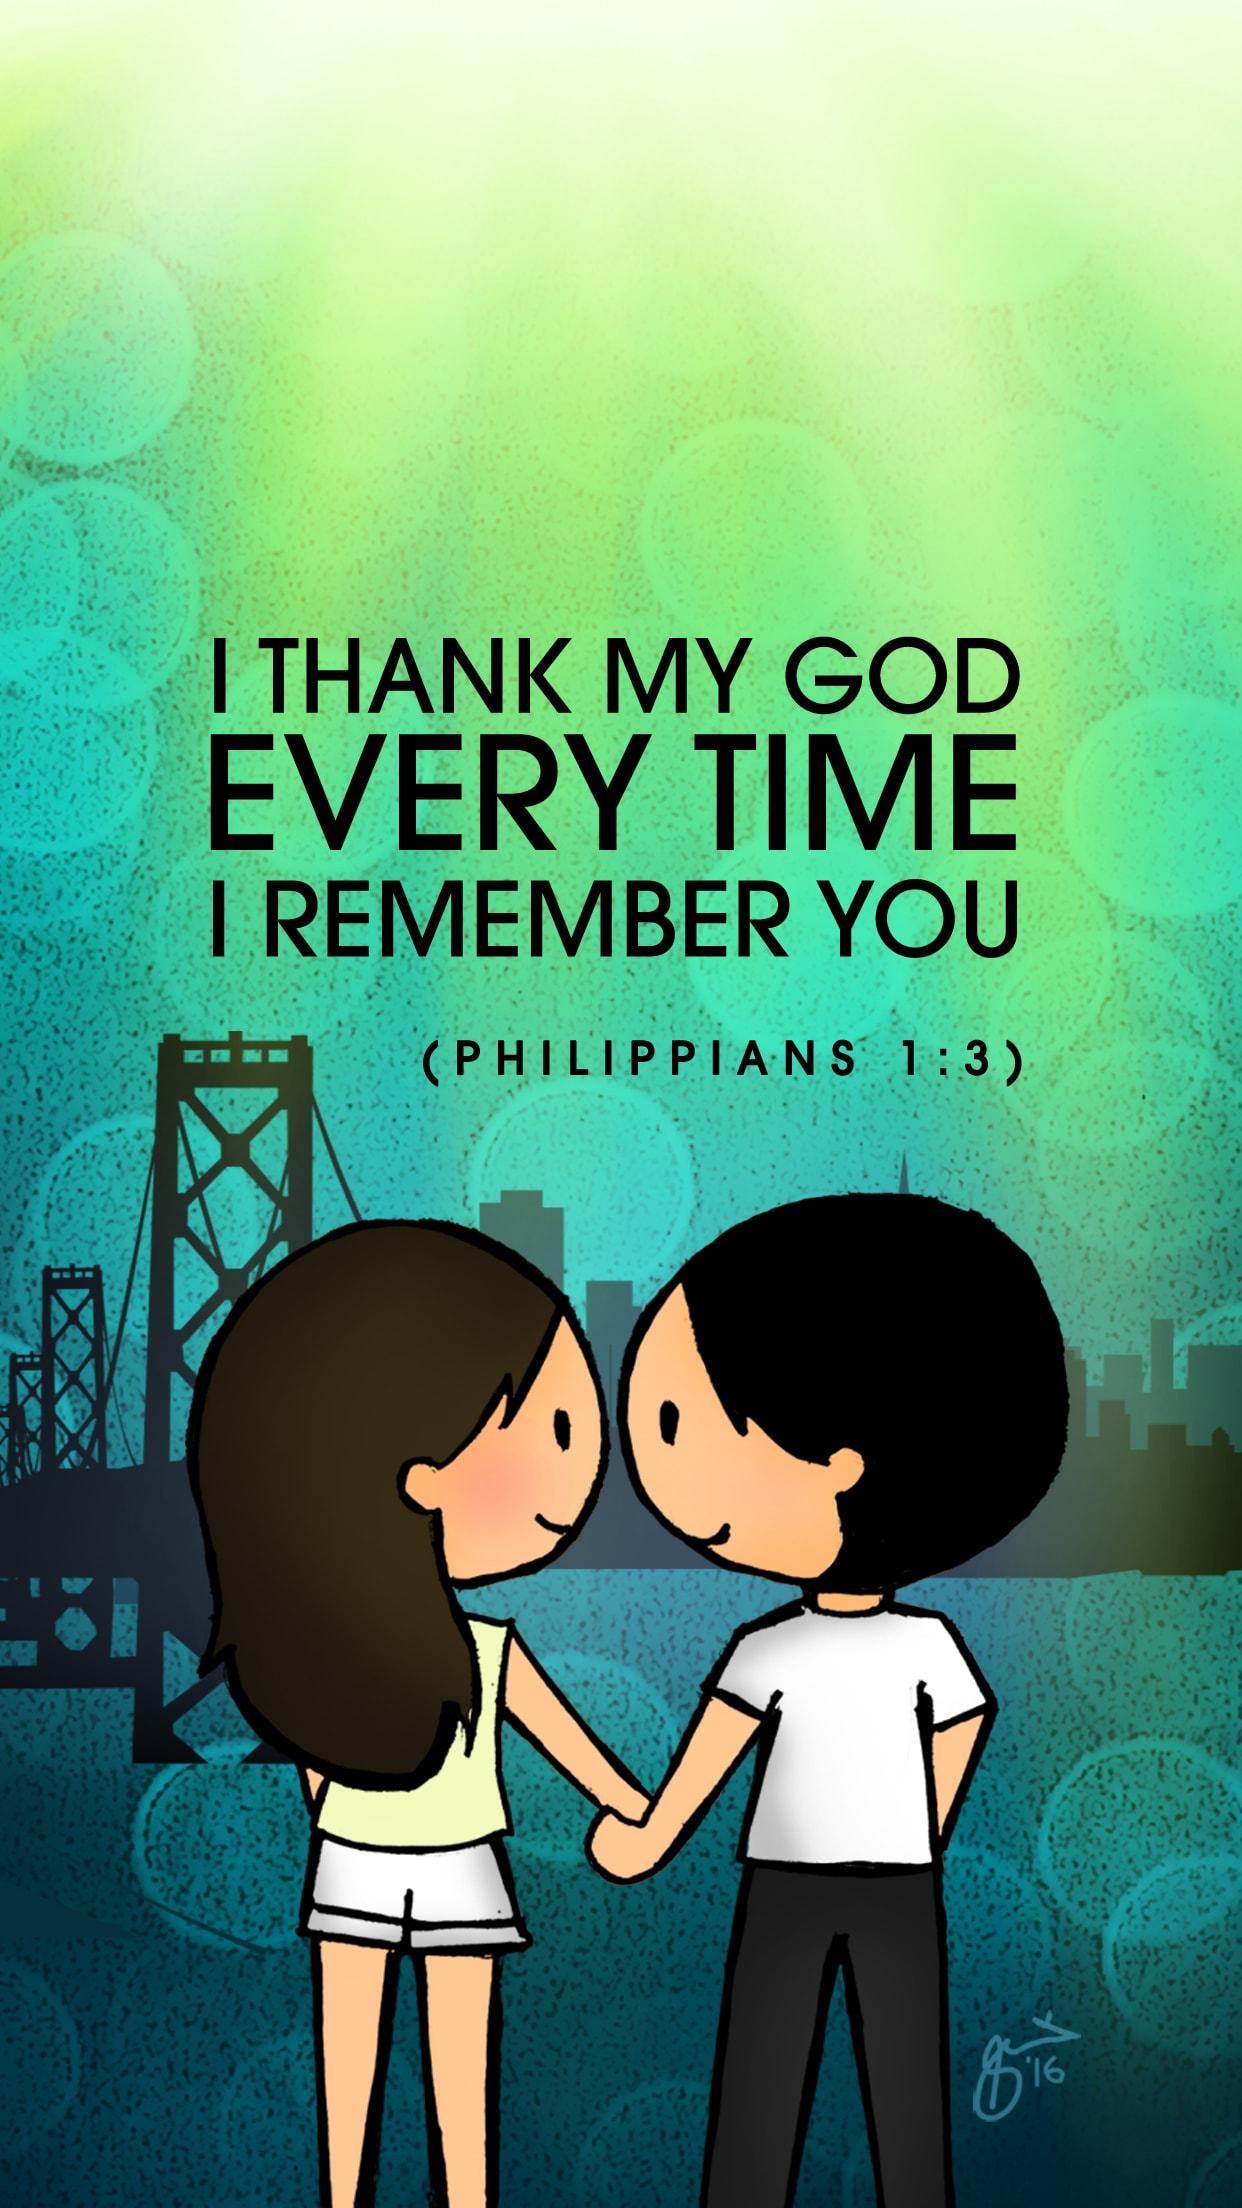 Free Download: Philippians 1:3 Wallpaper